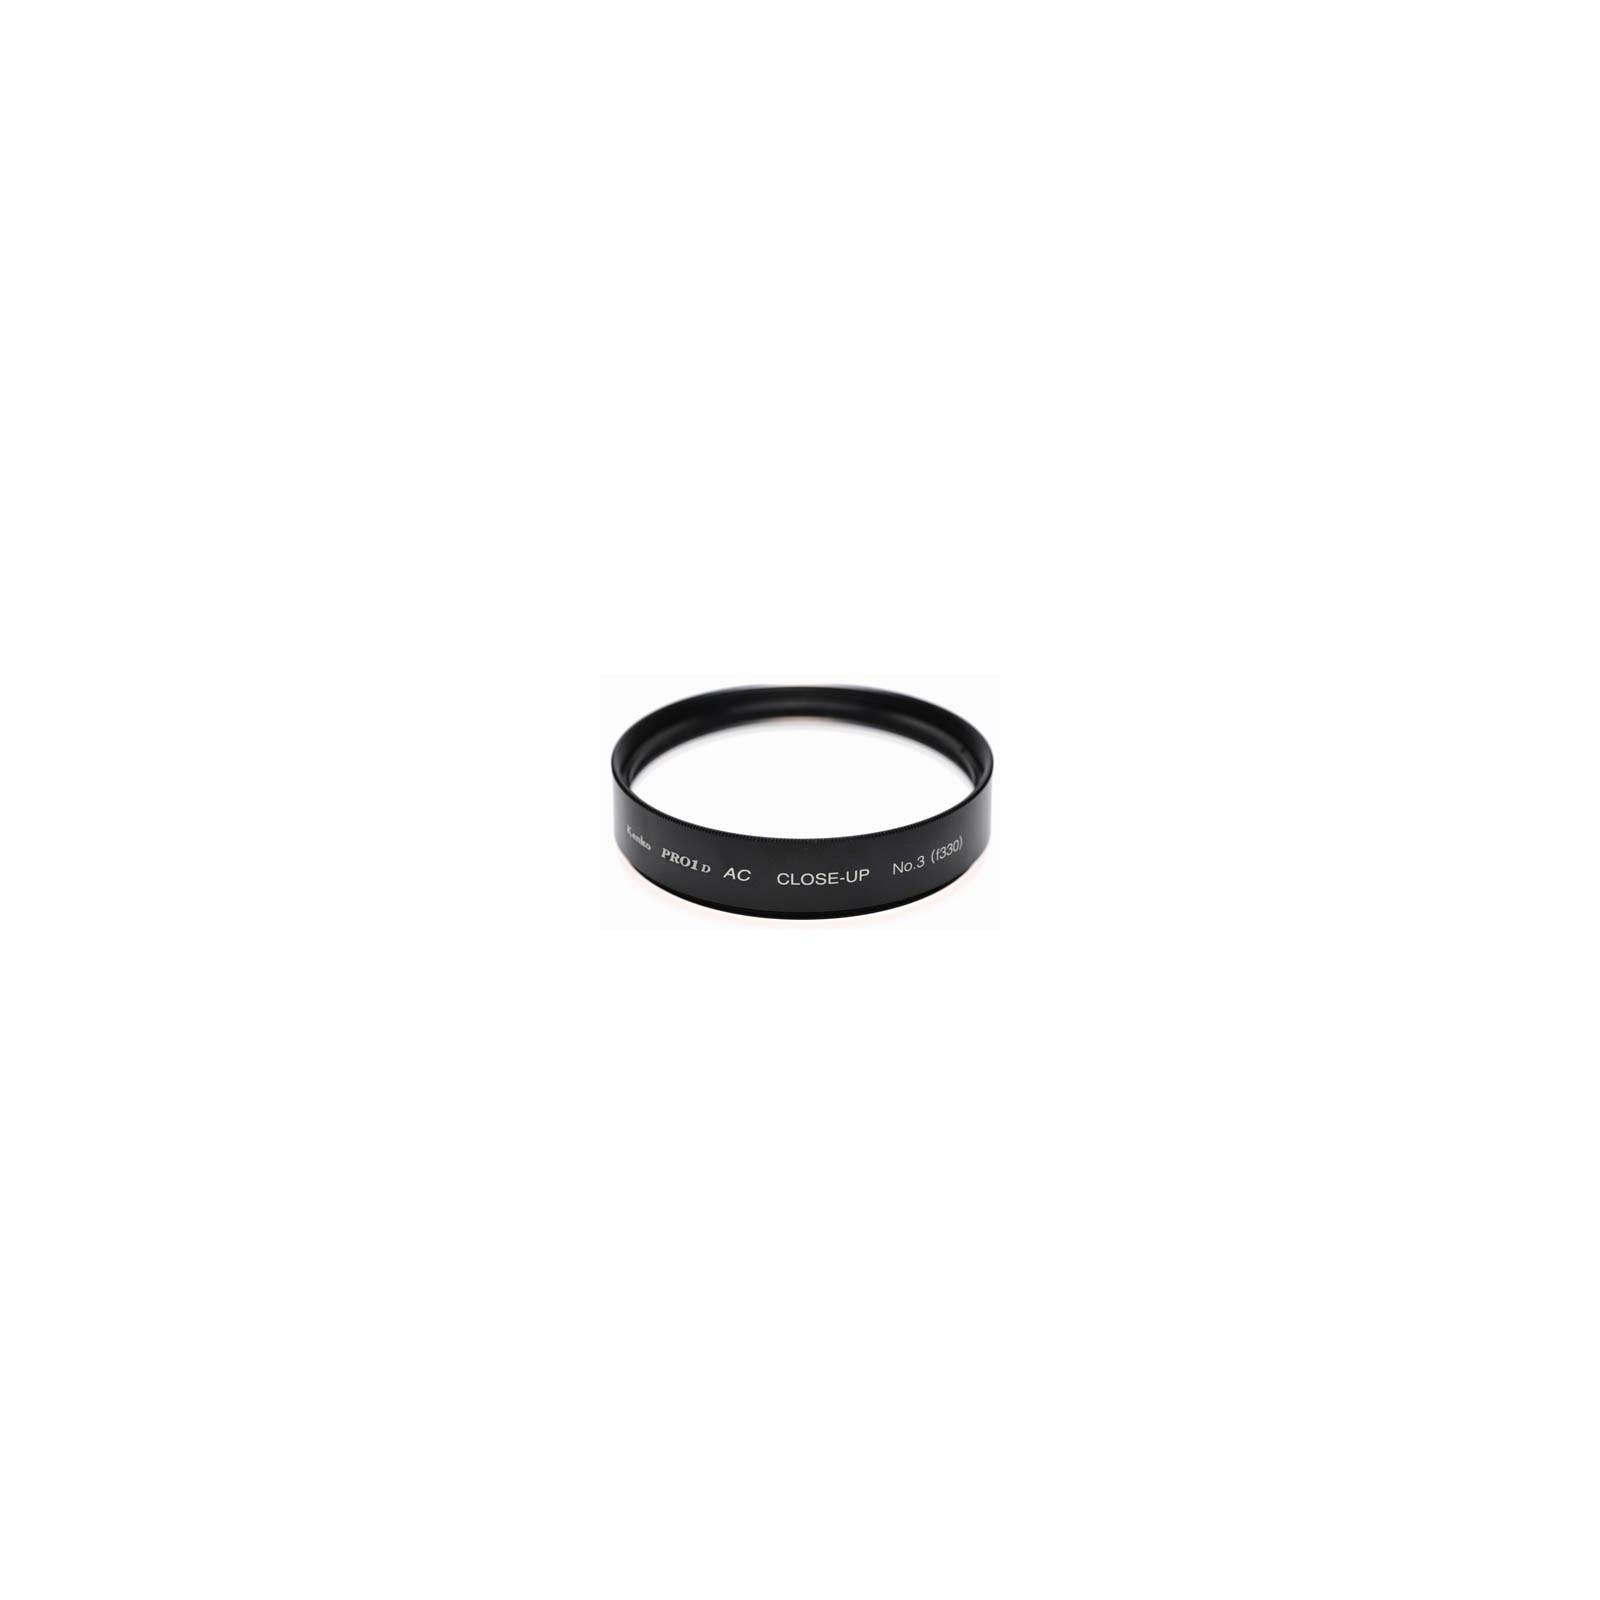 Светофильтр Kenko PRO1D AC CLOSE-UP No.3 52mm (235269)